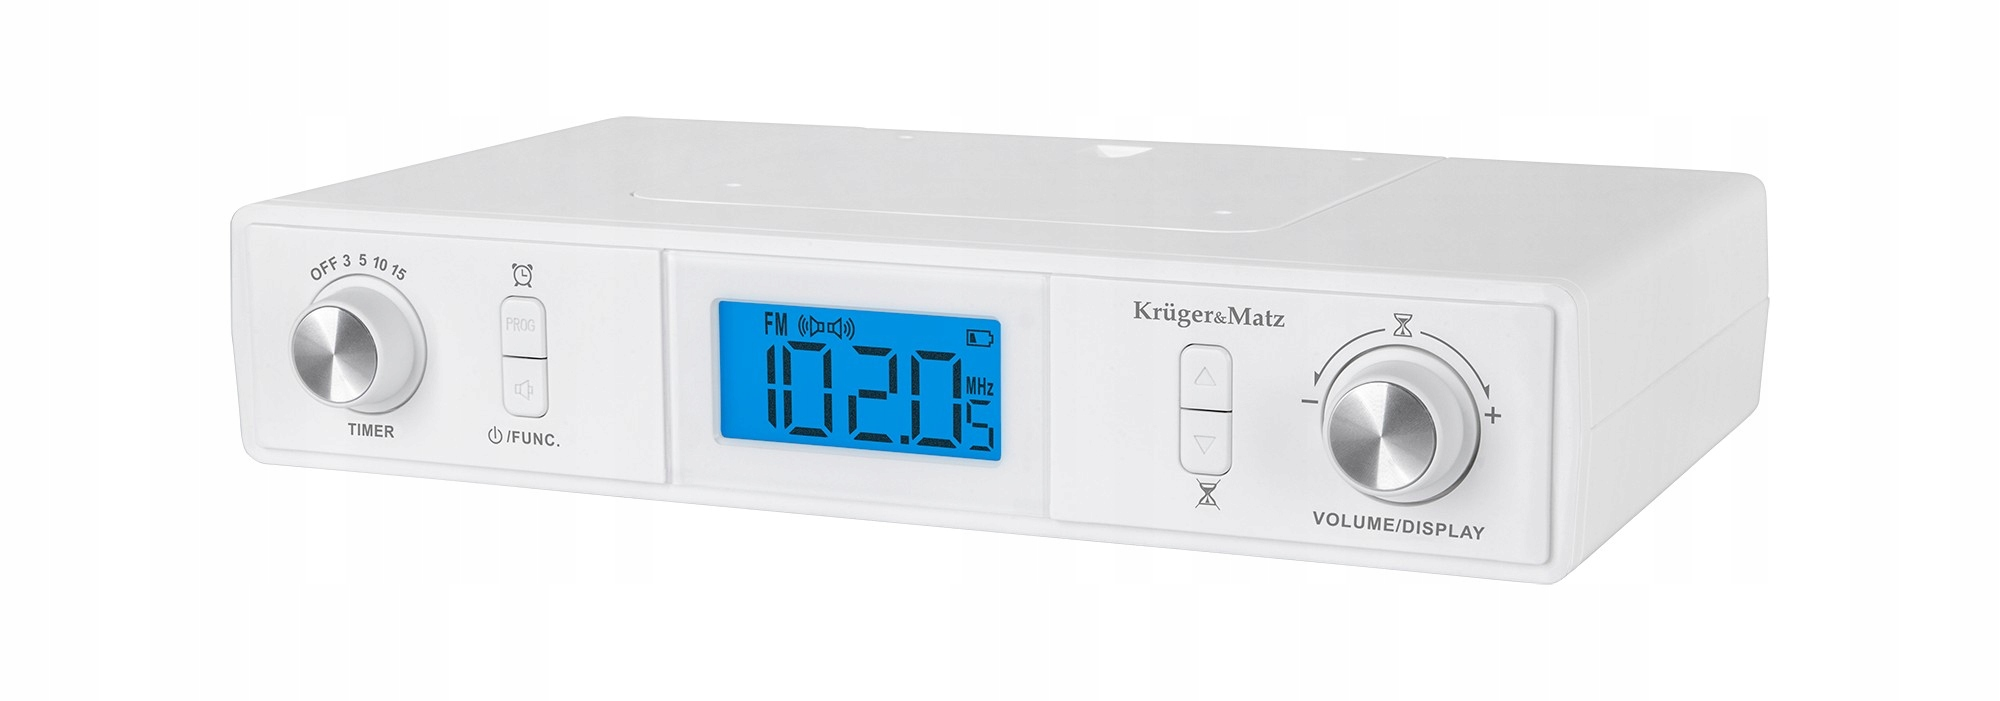 Кухонное радио Kruger & Matz BT MOUNTED